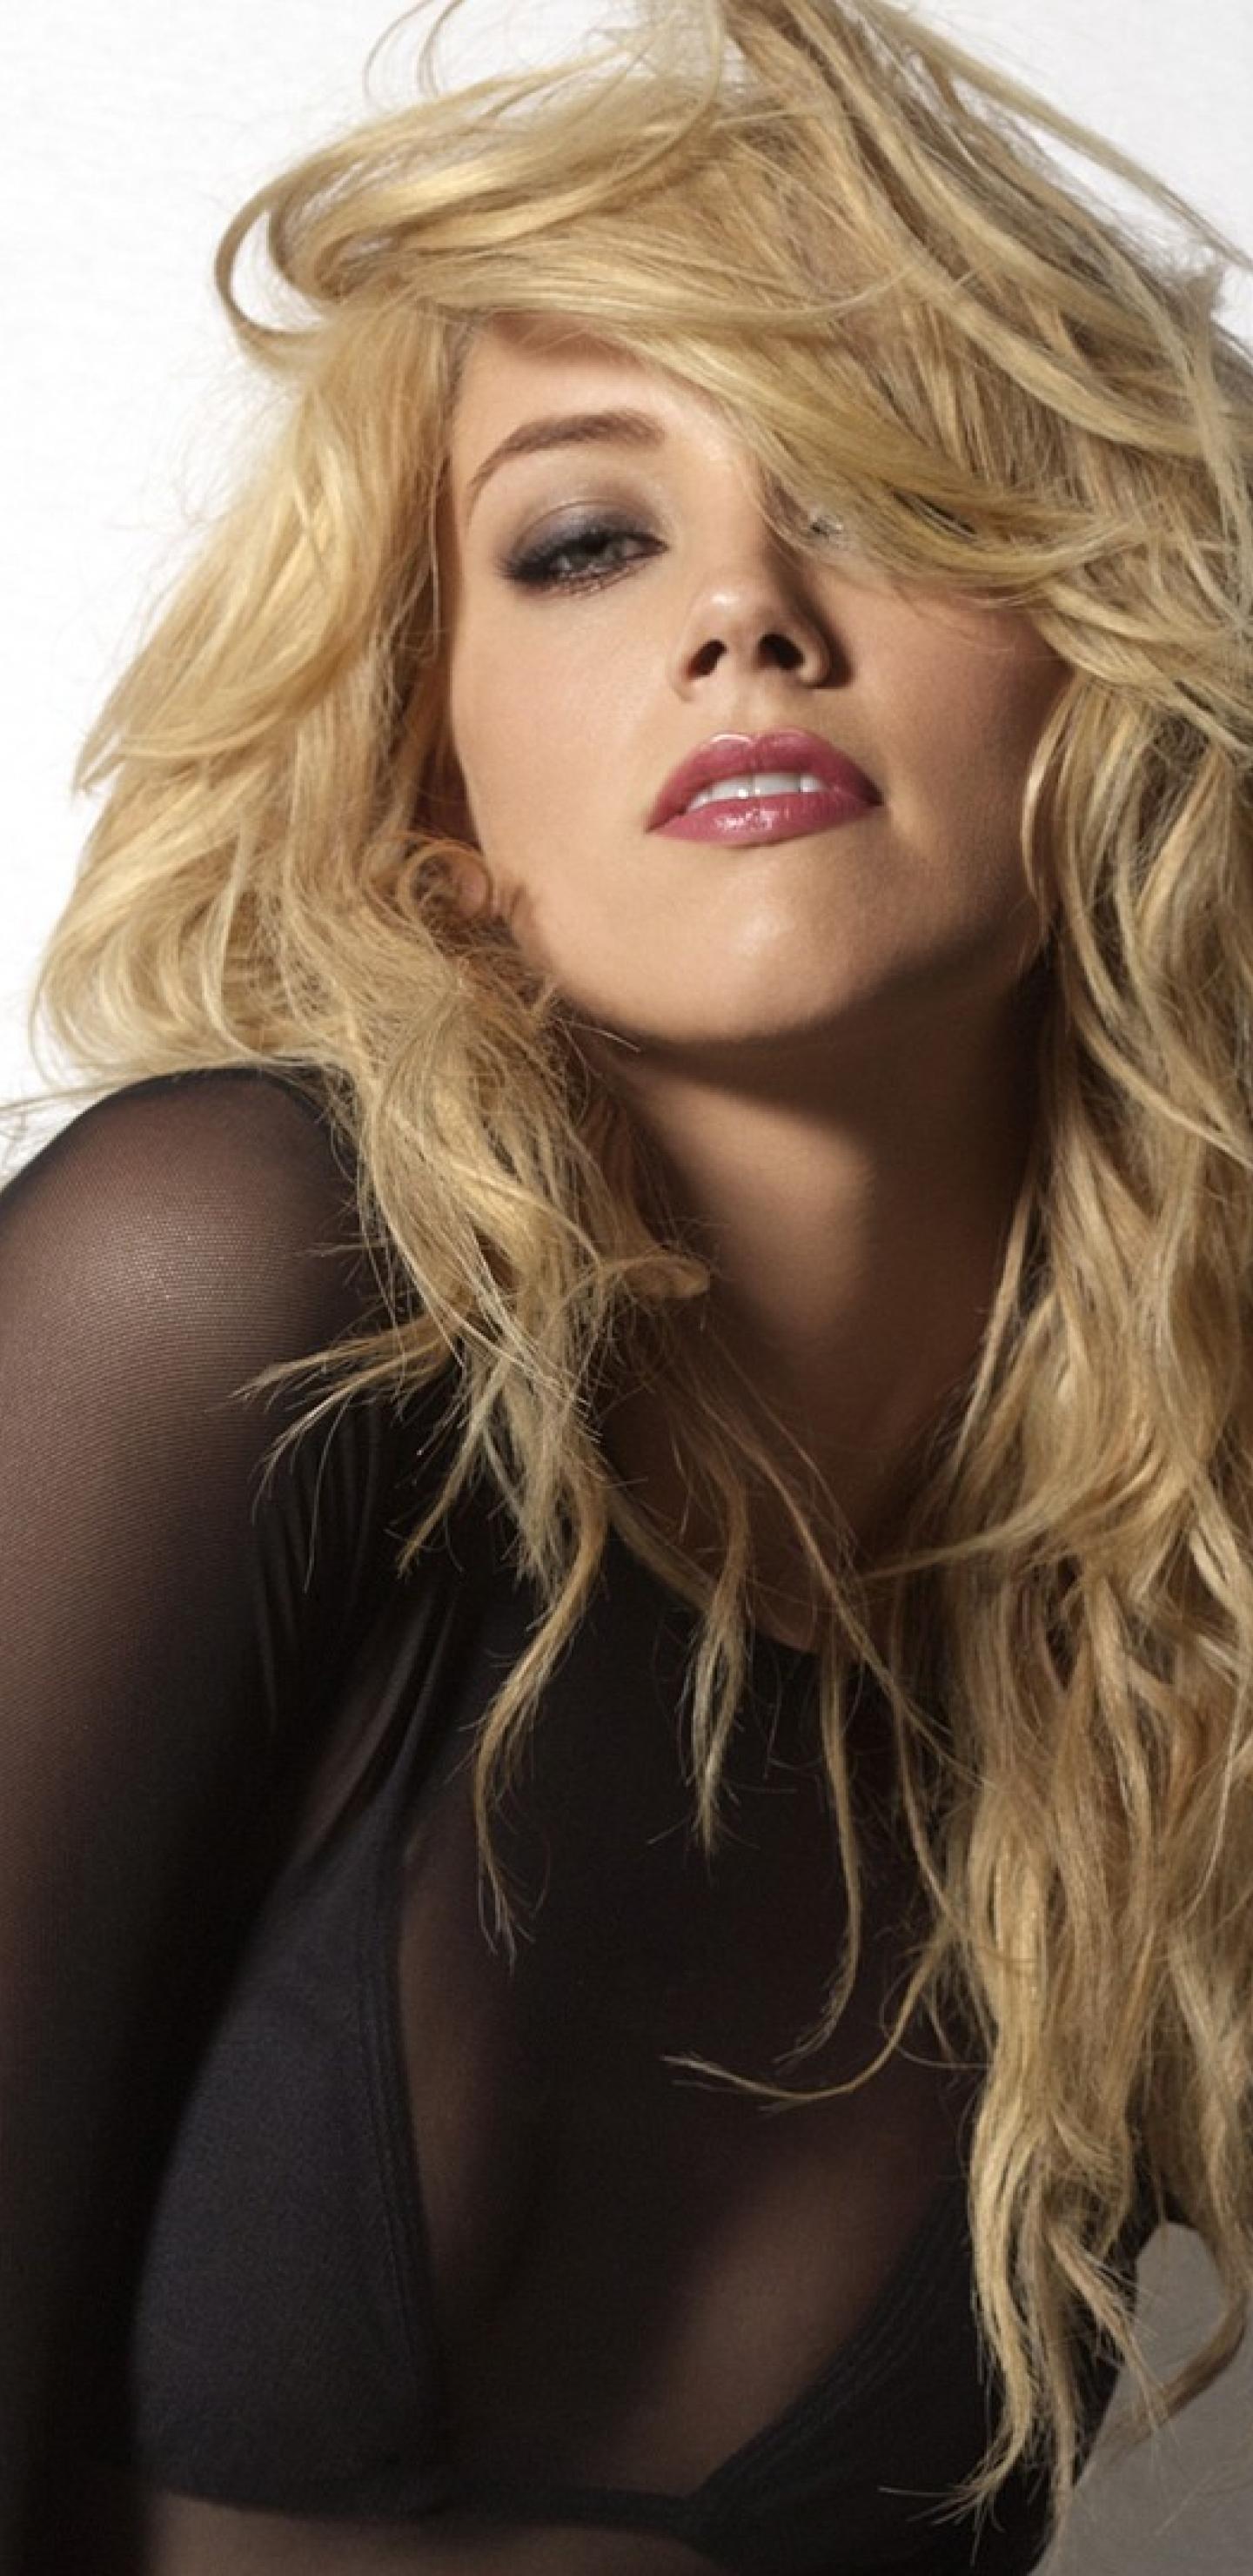 Amber Heard Sexy Hd Images Wallpaper, HD Celebrities 4K